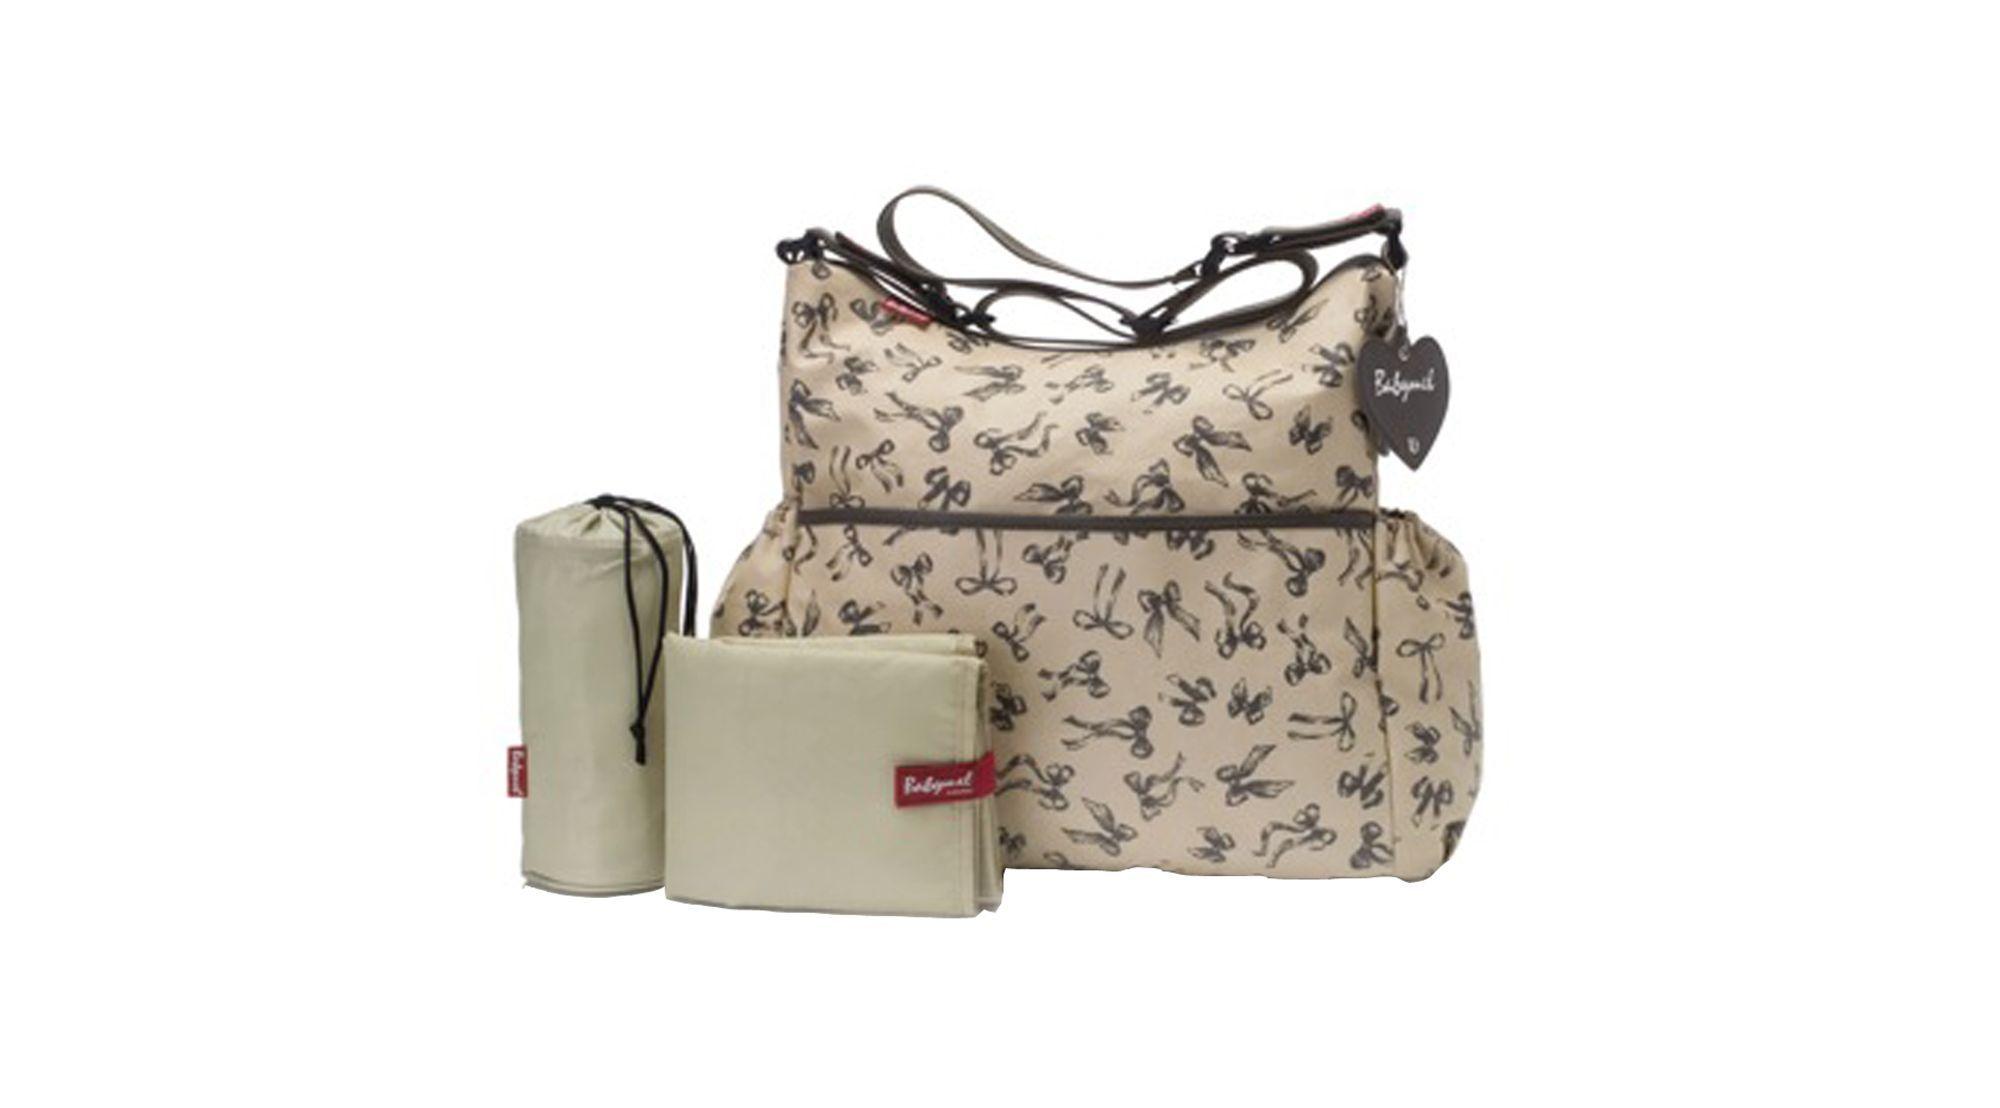 c8a661eb00f8 Babymel Slouchy Changing Bag - Vintage Bow. Babymel Slouchy Changing Bag -  Vintage Bow Cheap Diaper Bags